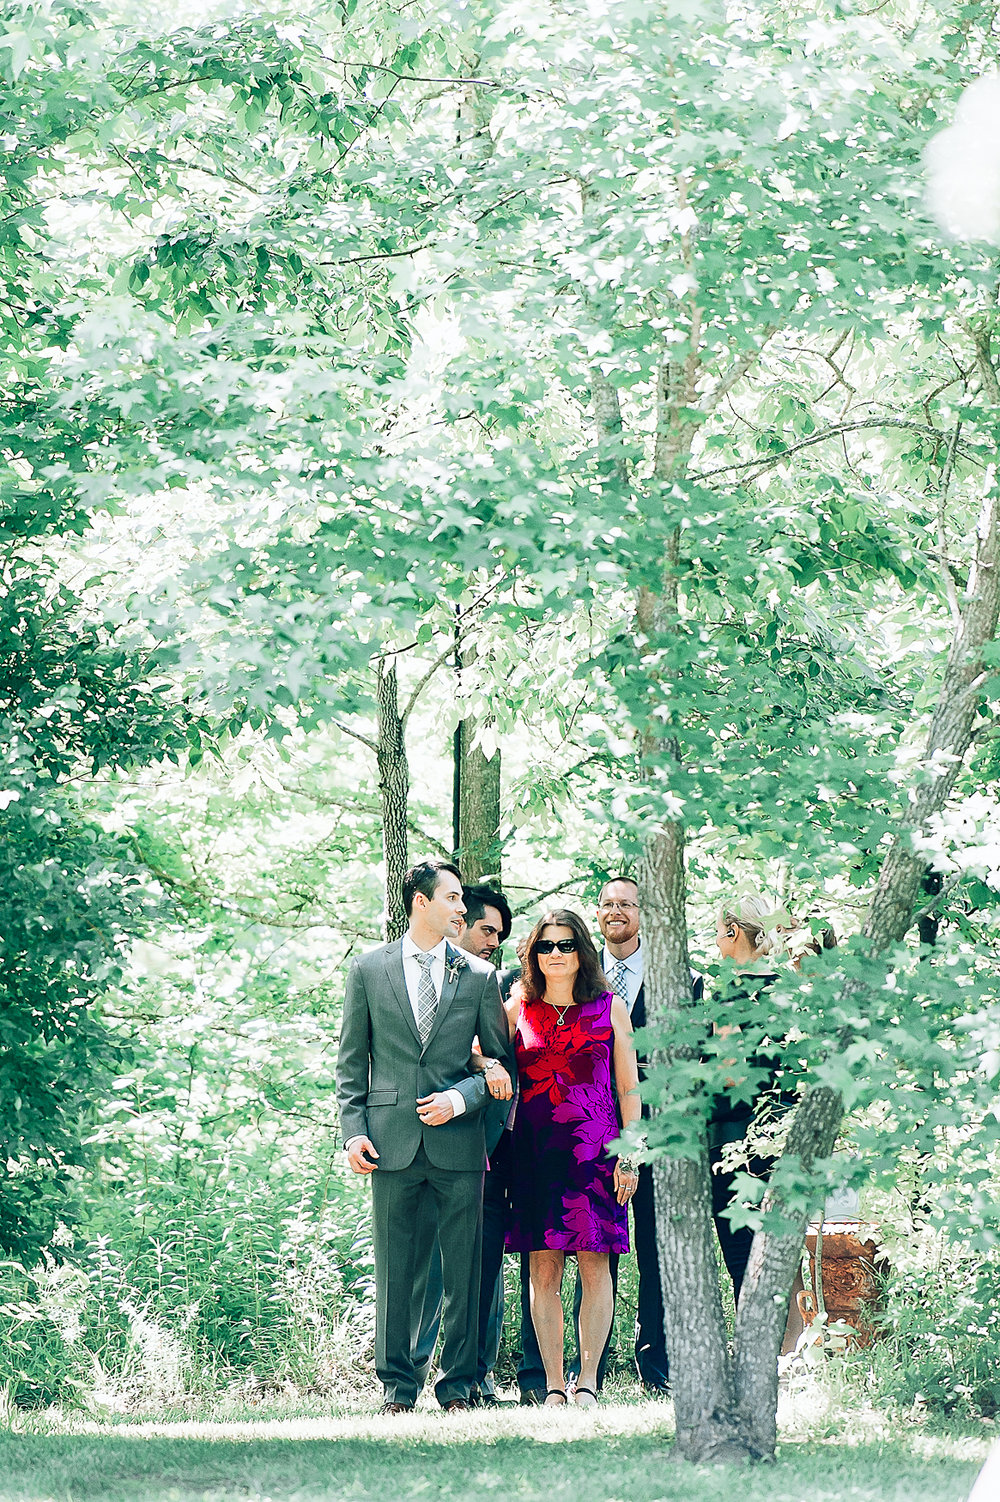 virginiawedding_theGlasgowFarm_rusticwedding_fredericksburg_youseephotography_CarolineDale (32).jpg